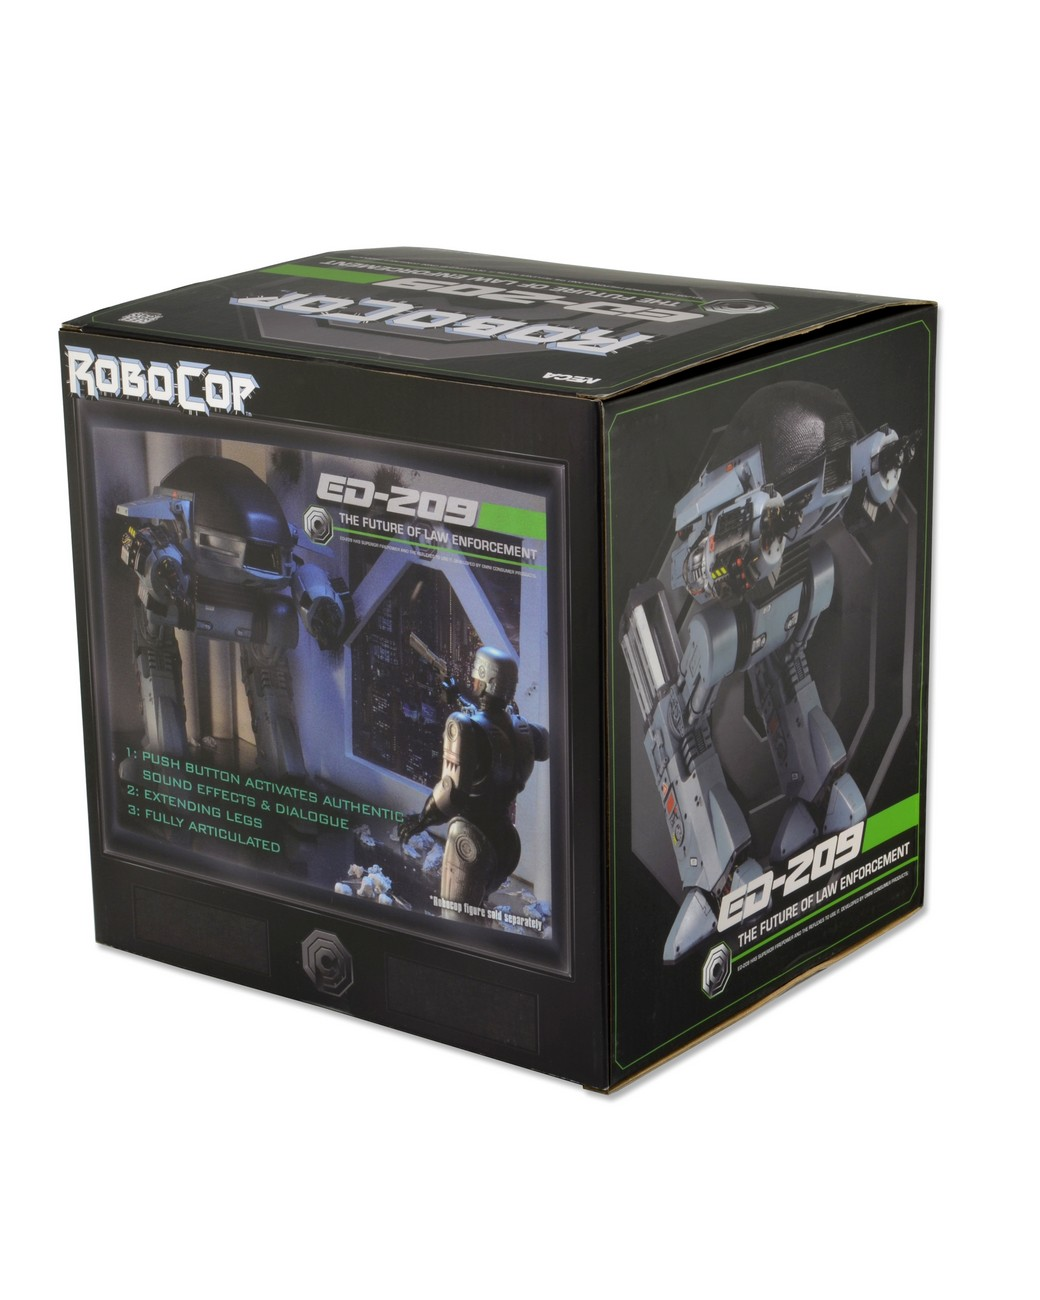 [NECA] RoboCop - ED-209 NECA-Robocop-1987-ED-209-010